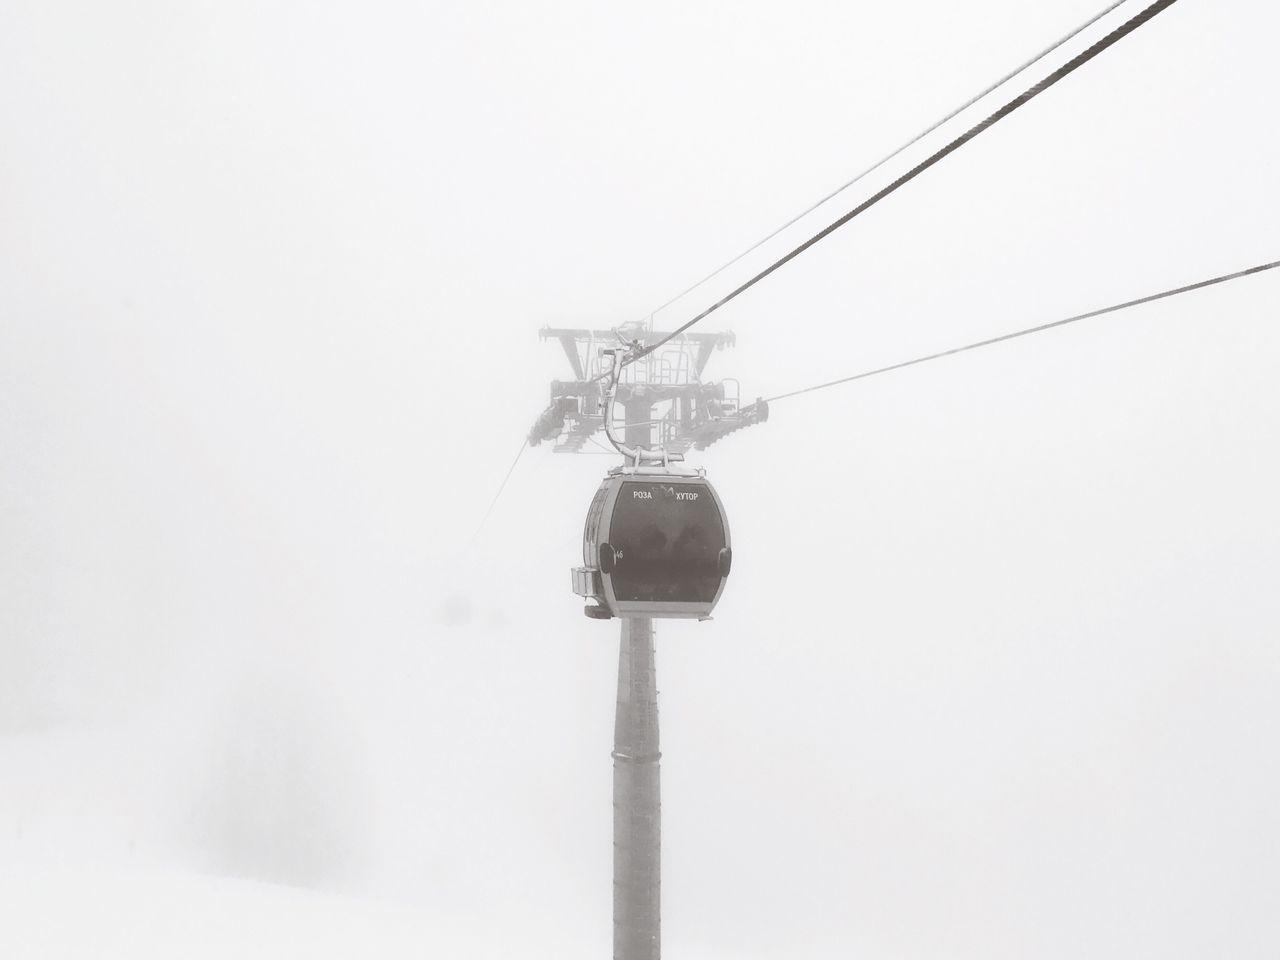 Cold Temperature White Background Fog Sochi Krasnaya Polyana